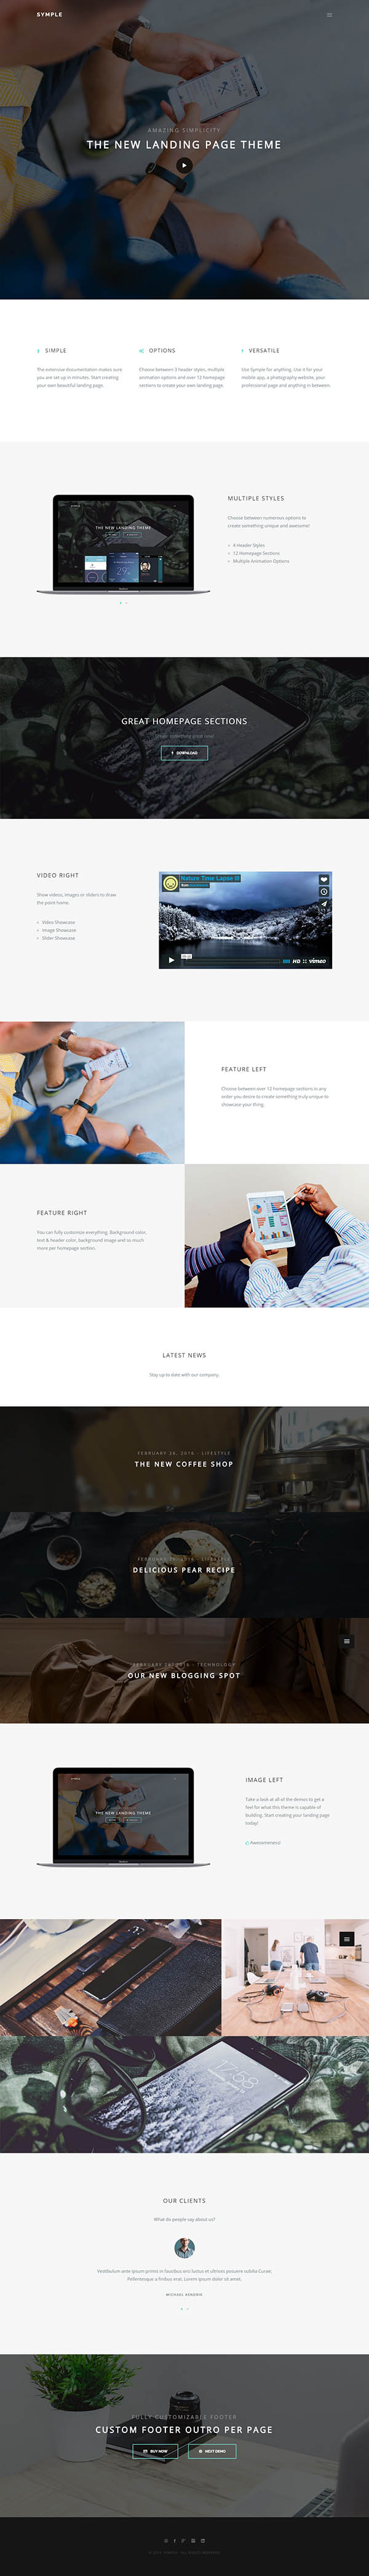 Symple - Clean & Minimal Landing Page Theme